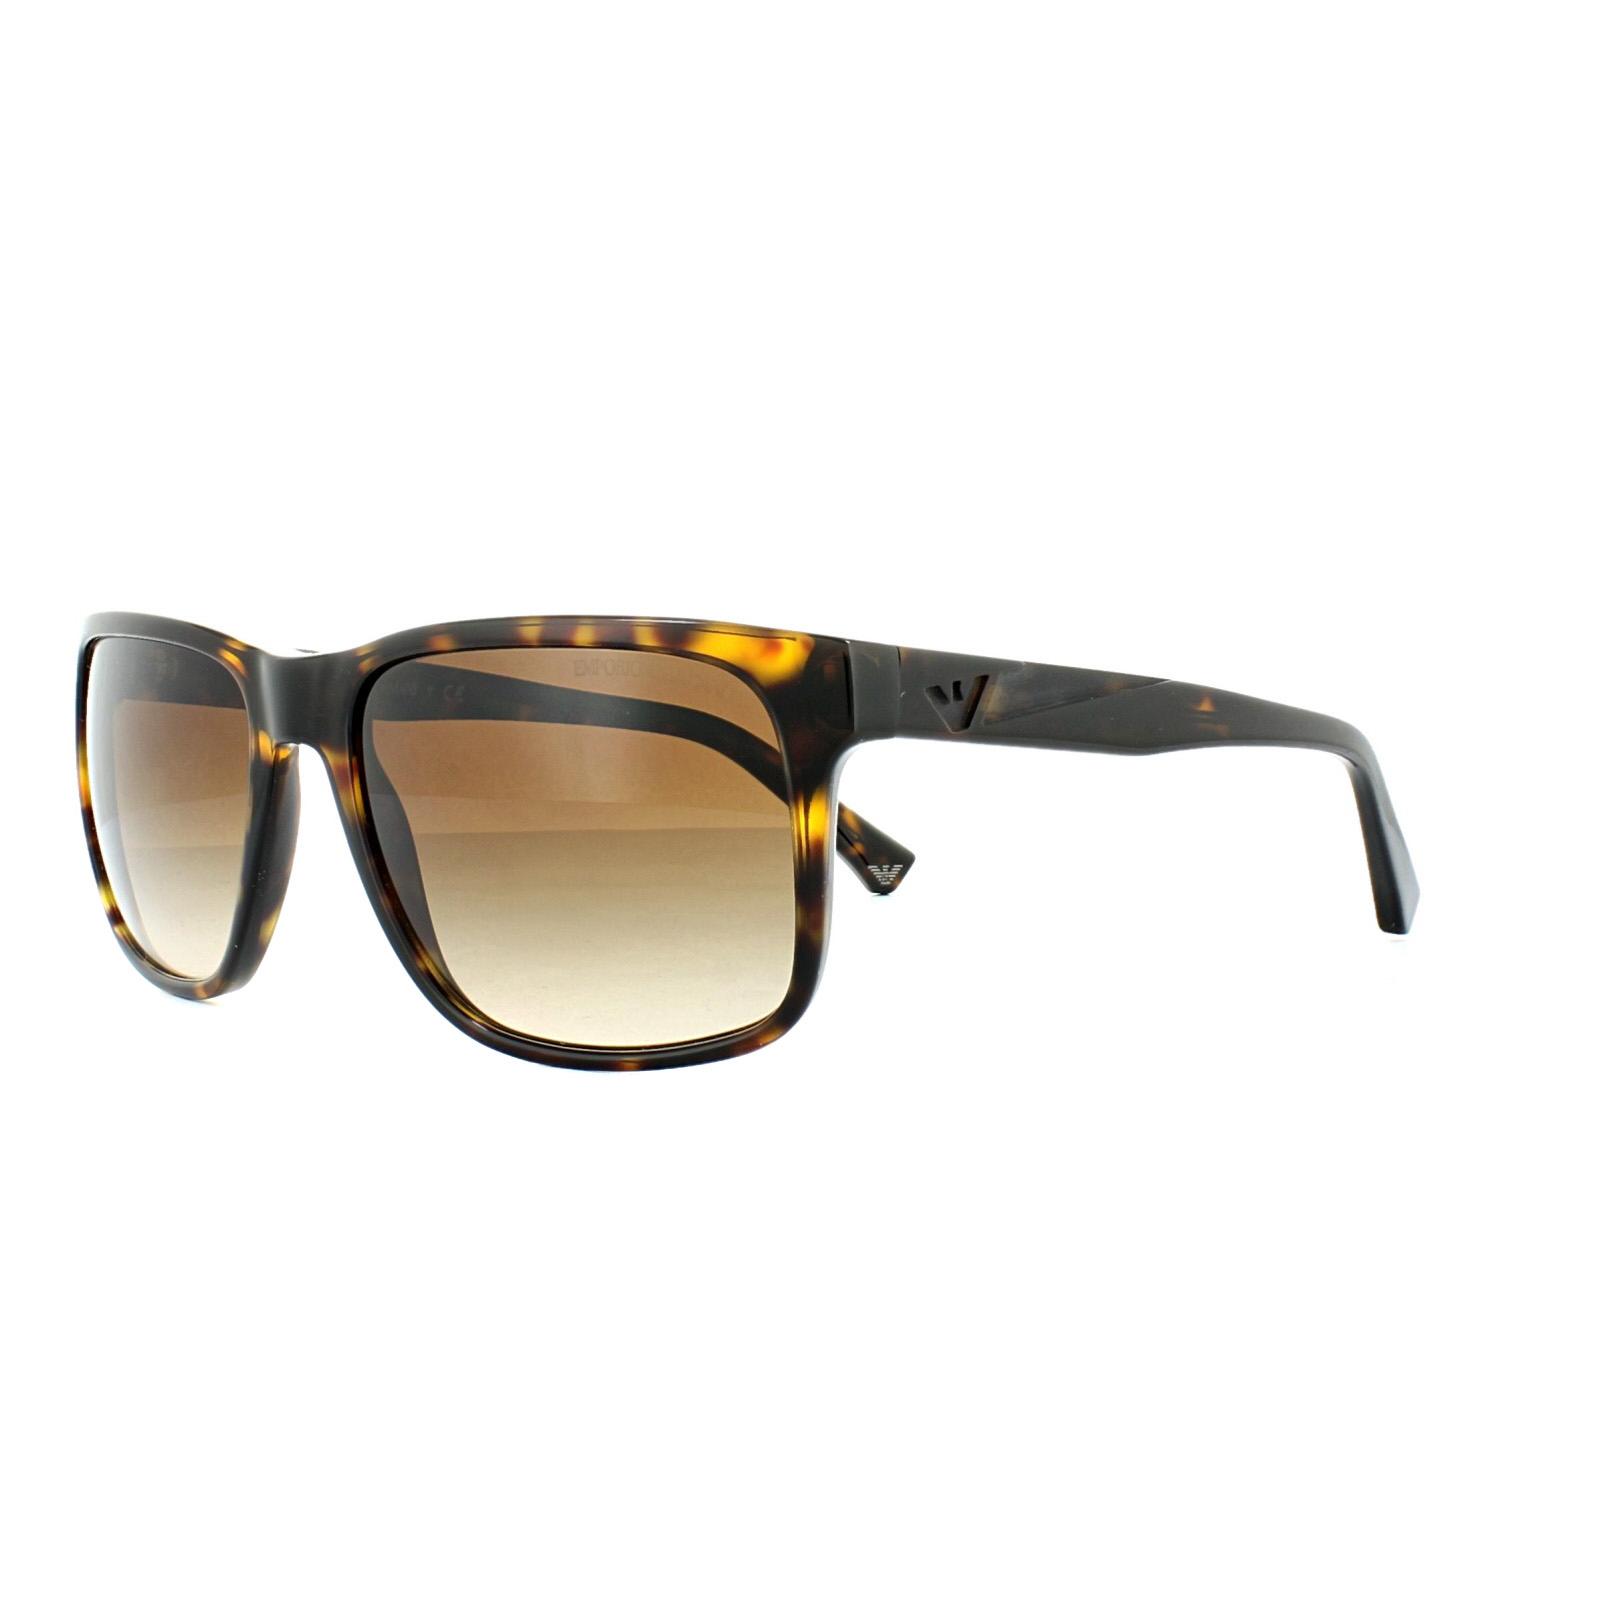 157d8501f534 Sentinel Emporio Armani Sunglasses 4071 5026 13 Dark Havana Brown Gradient